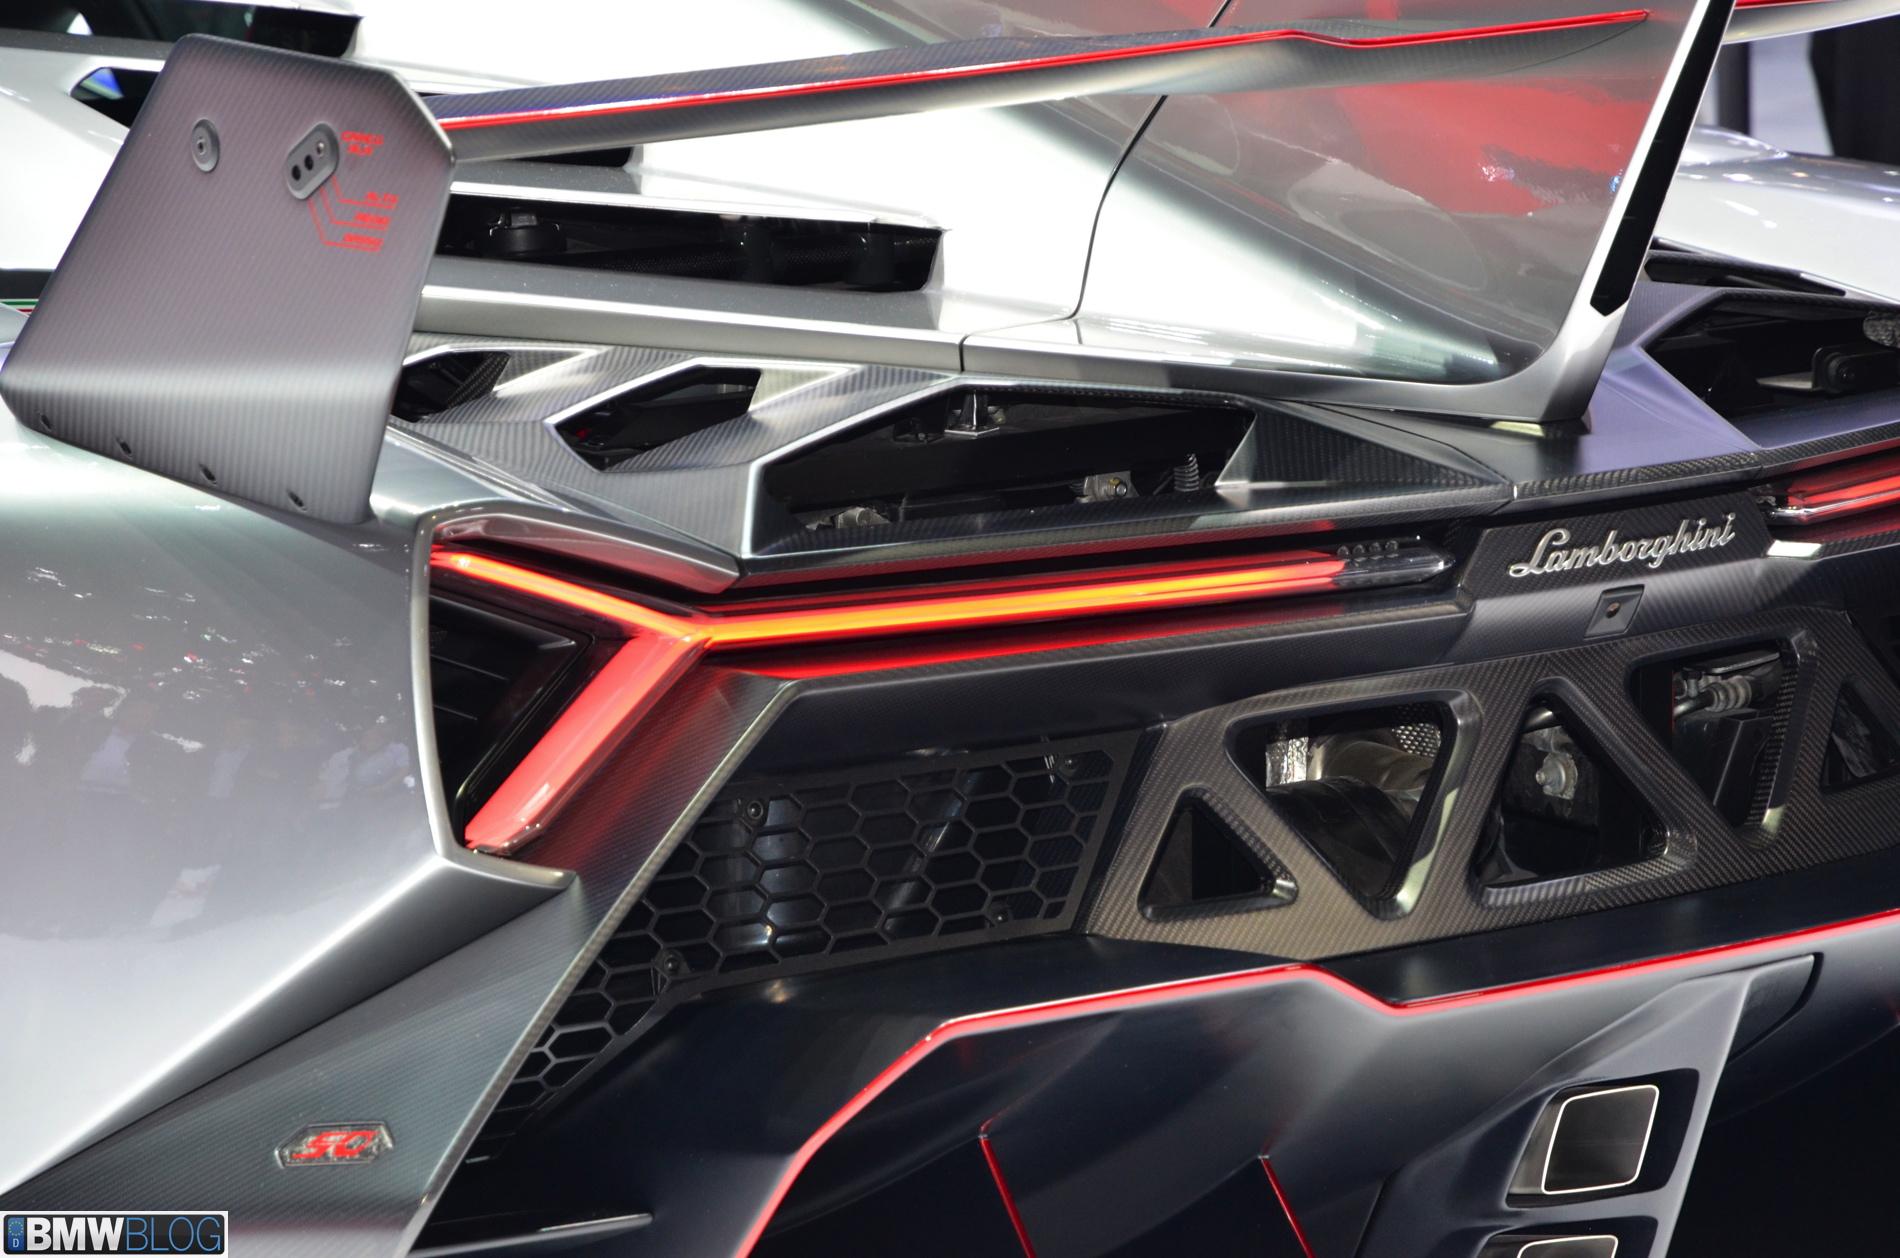 2013 Geneva: Lamborghini Veneno